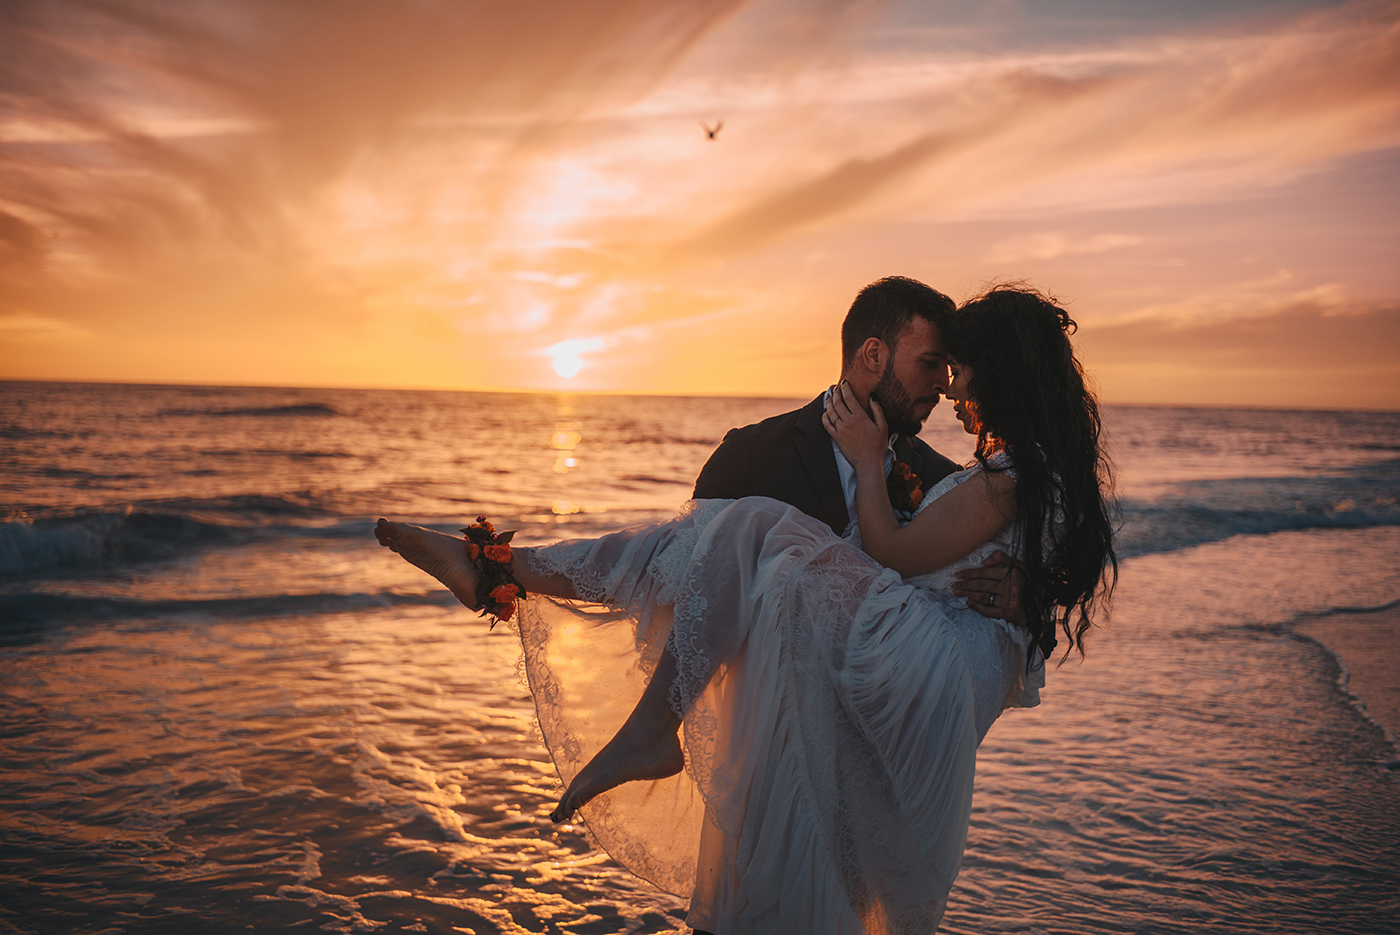 Los-Vargas-Photo-Moana-Wedding-Style-shoot-125.jpg